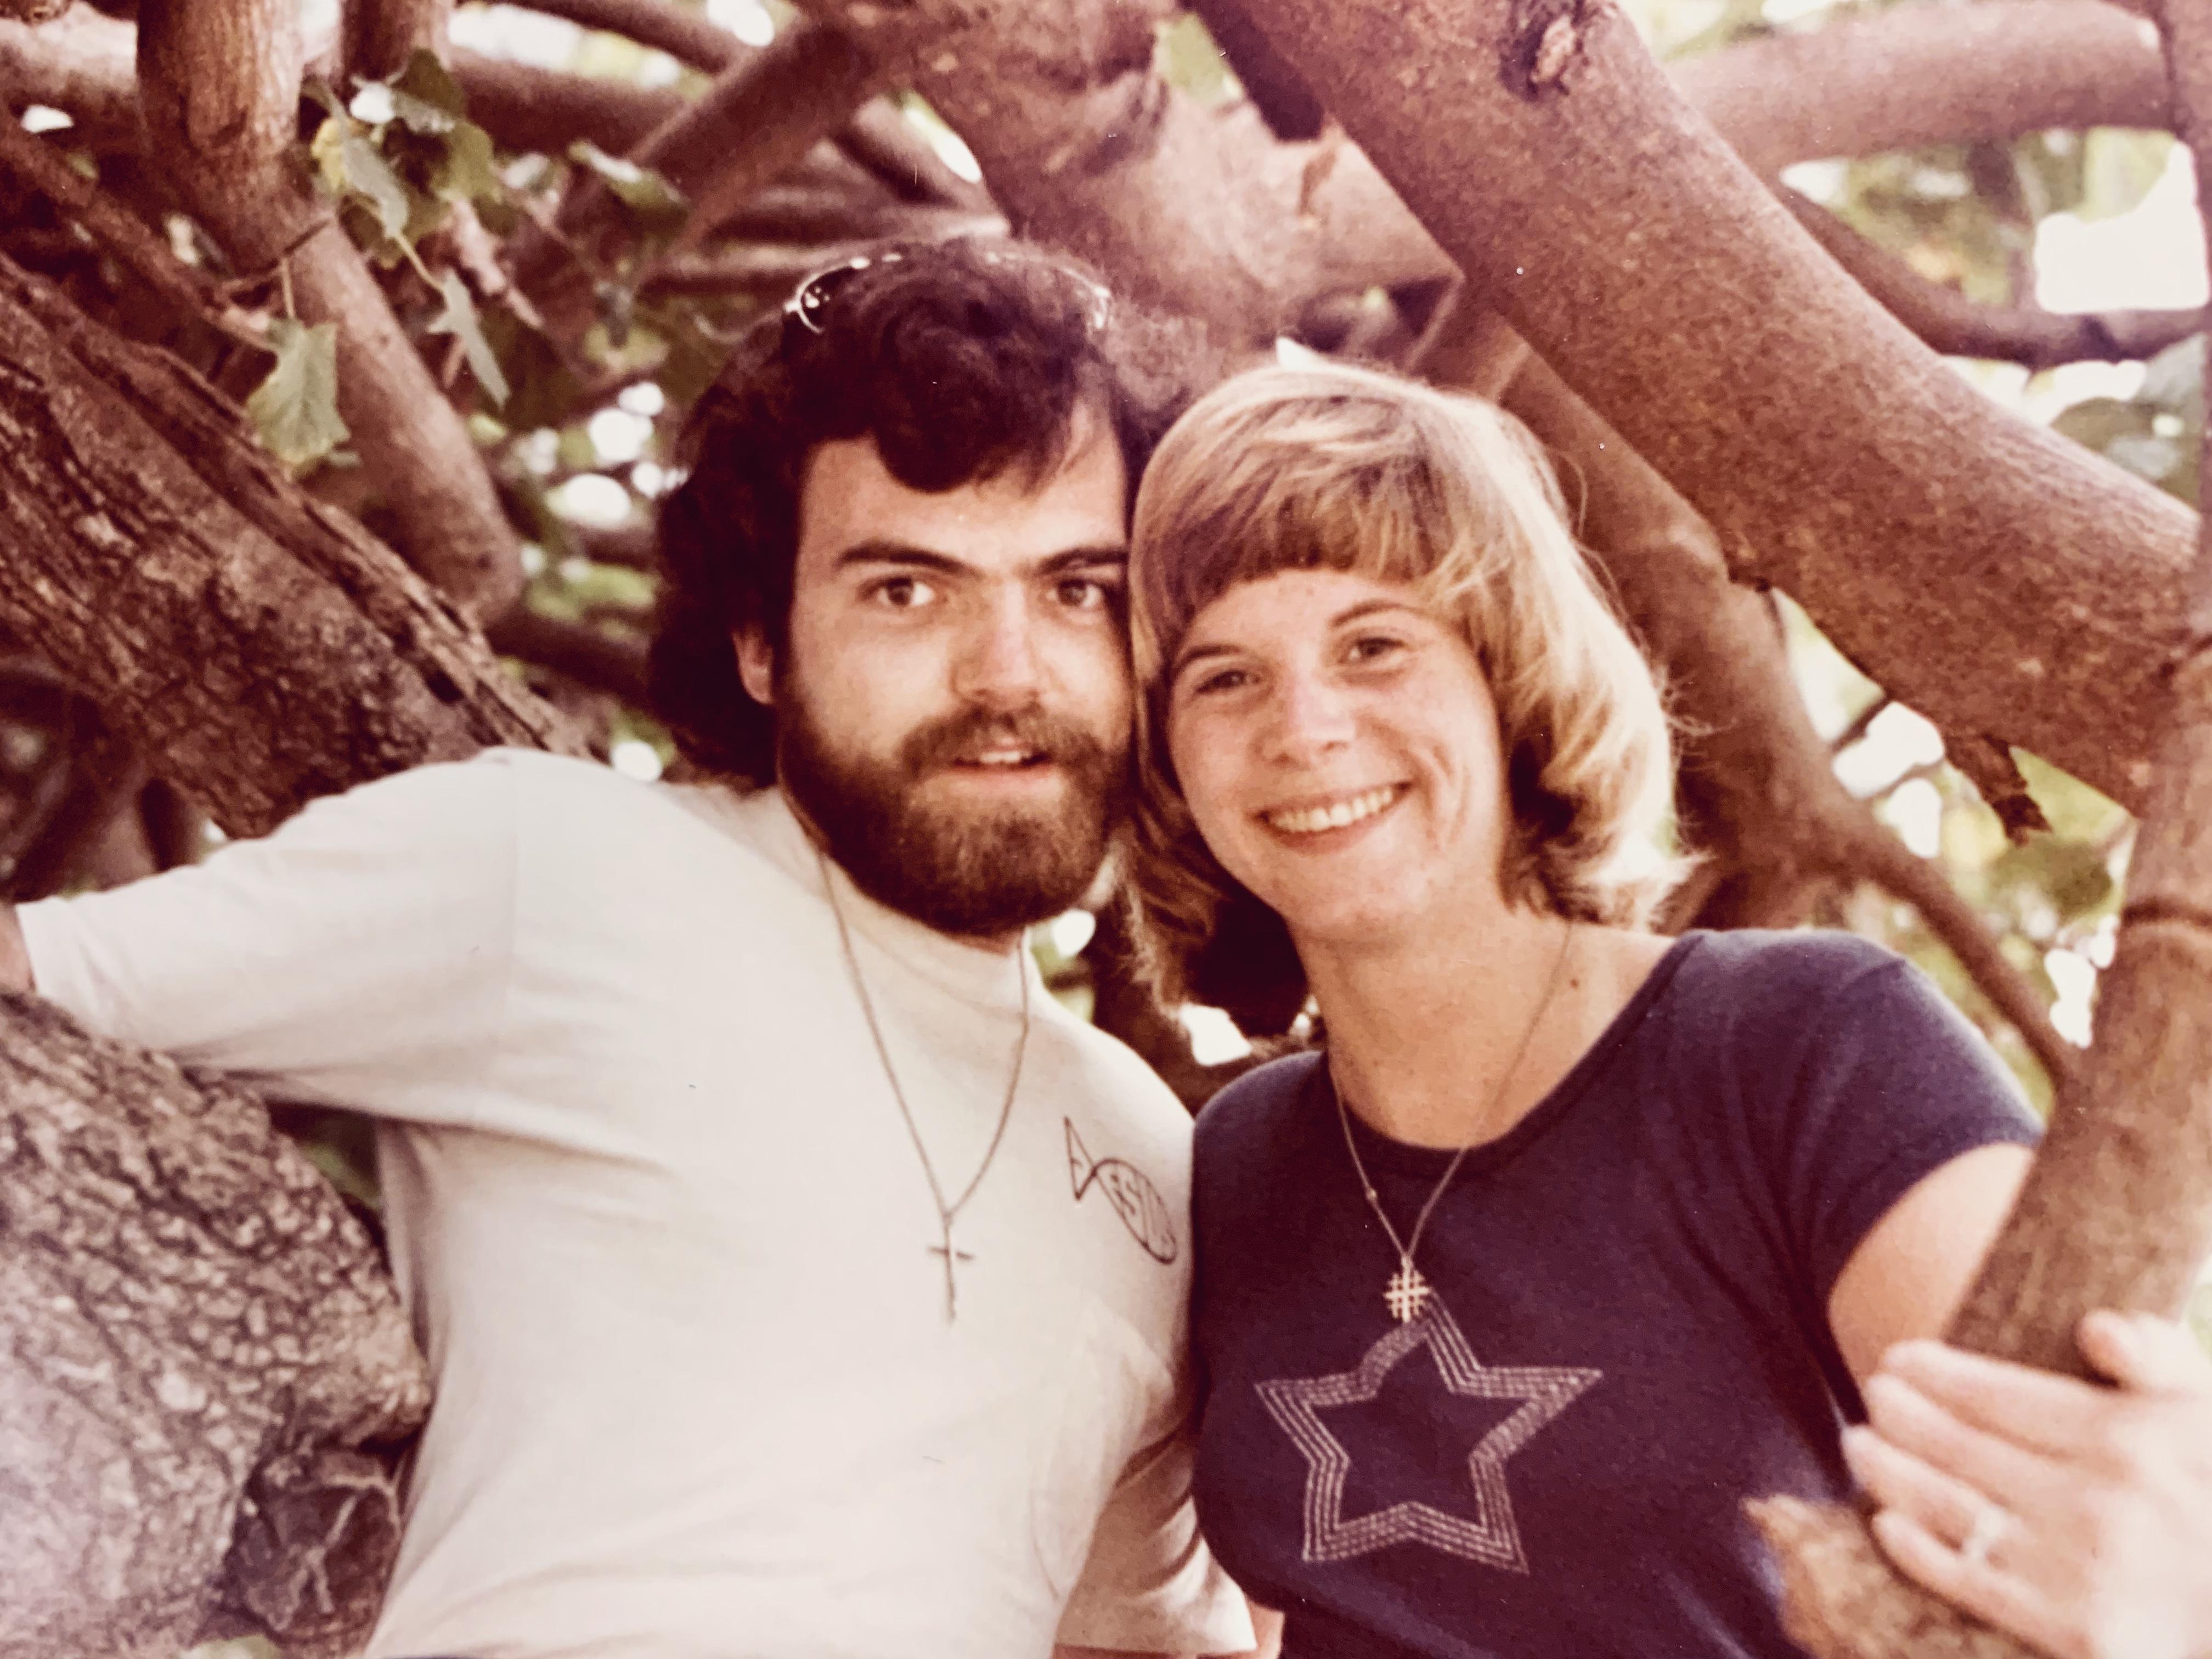 Steve & Susie Swanson